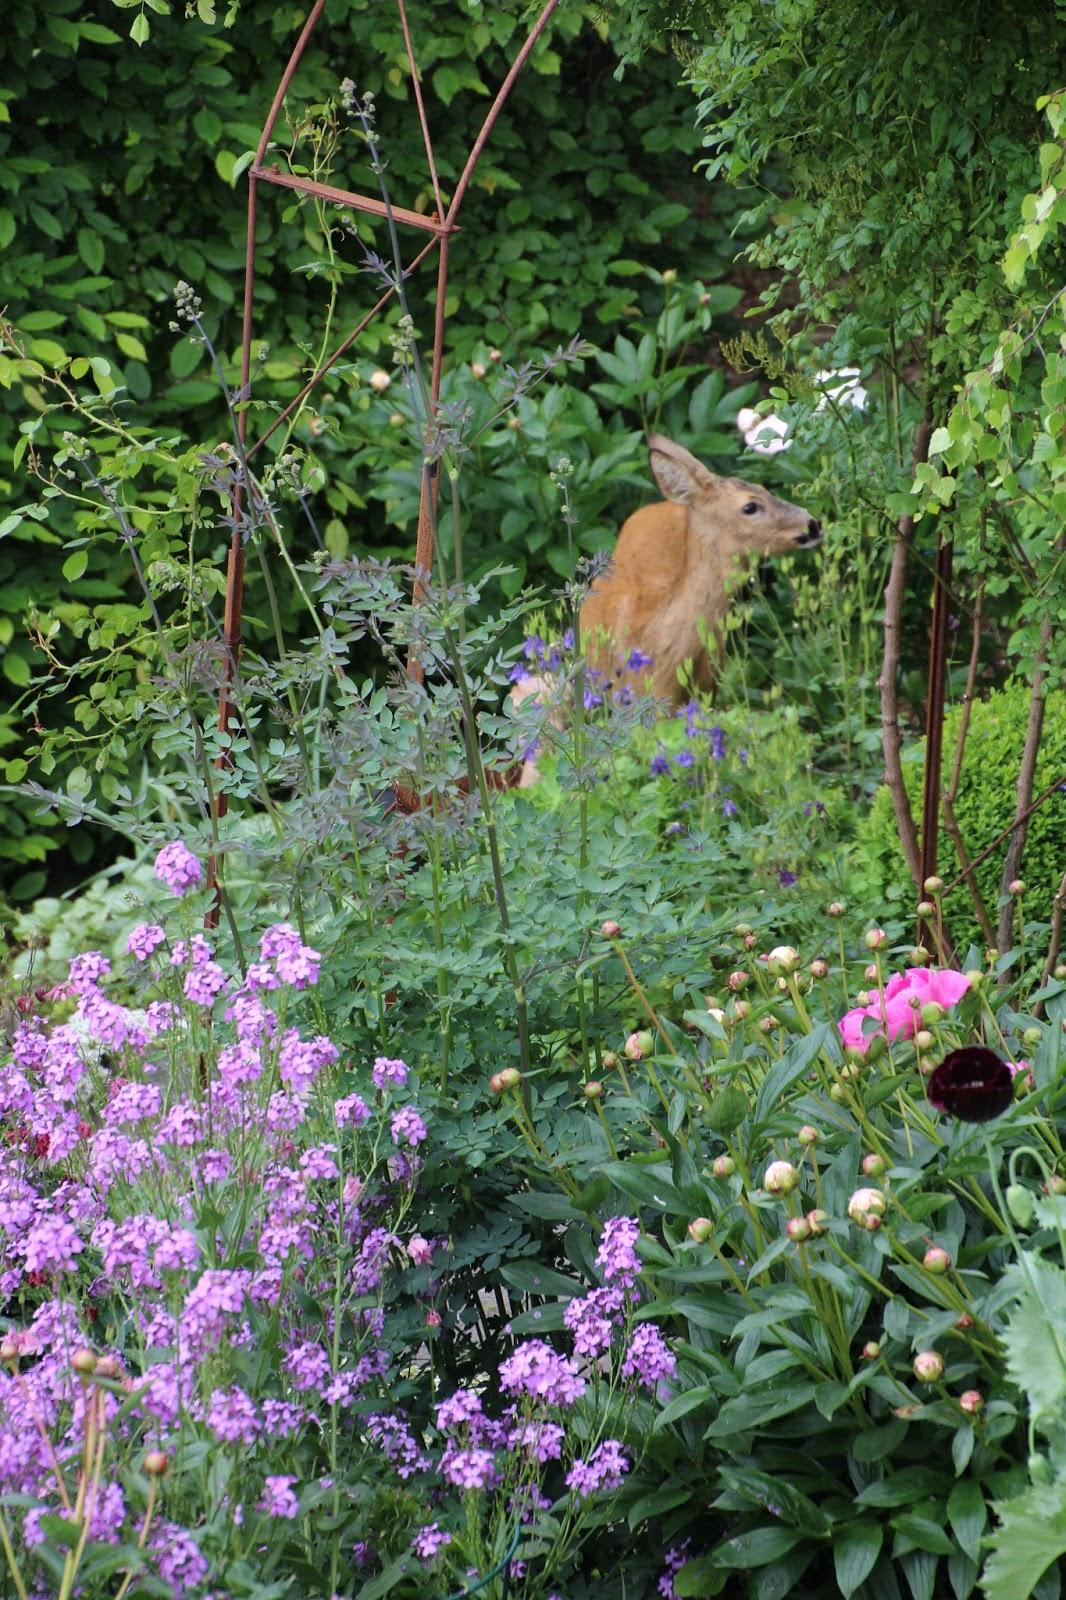 rådjur i trädgården